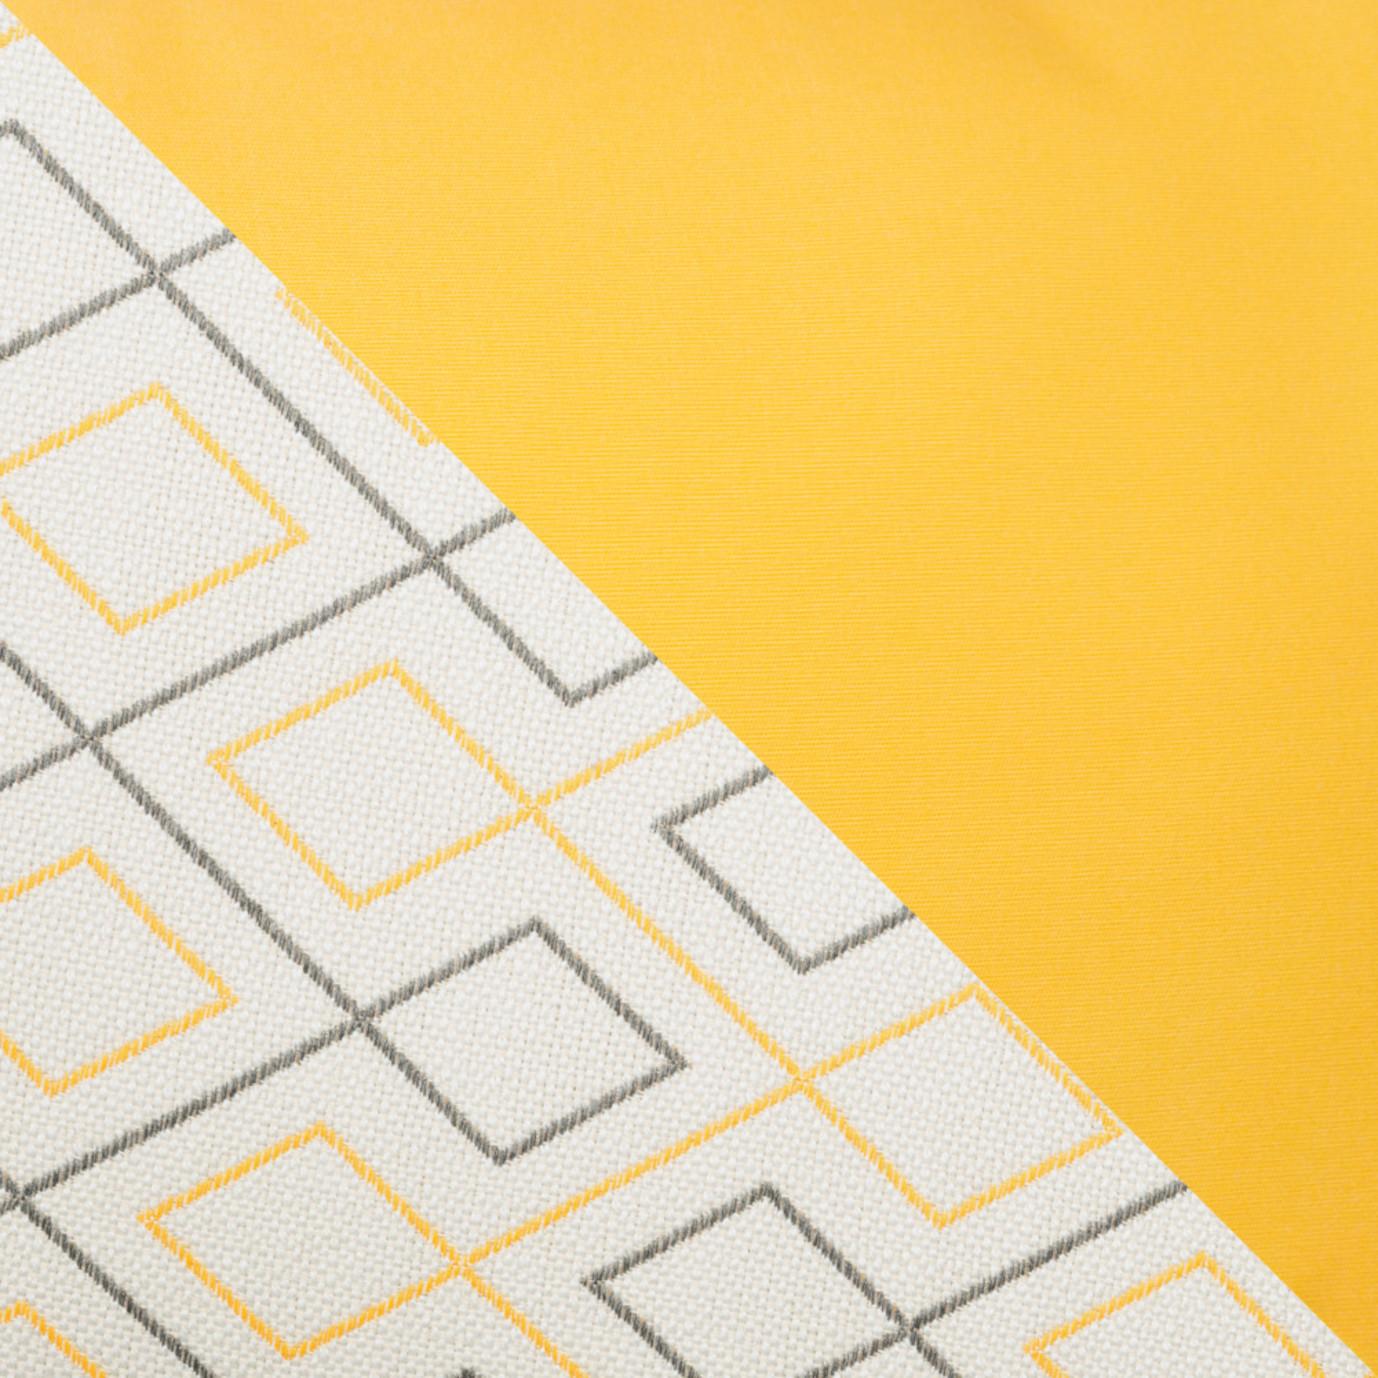 Deco™ Club Chairs - Sunflower Yellow Design